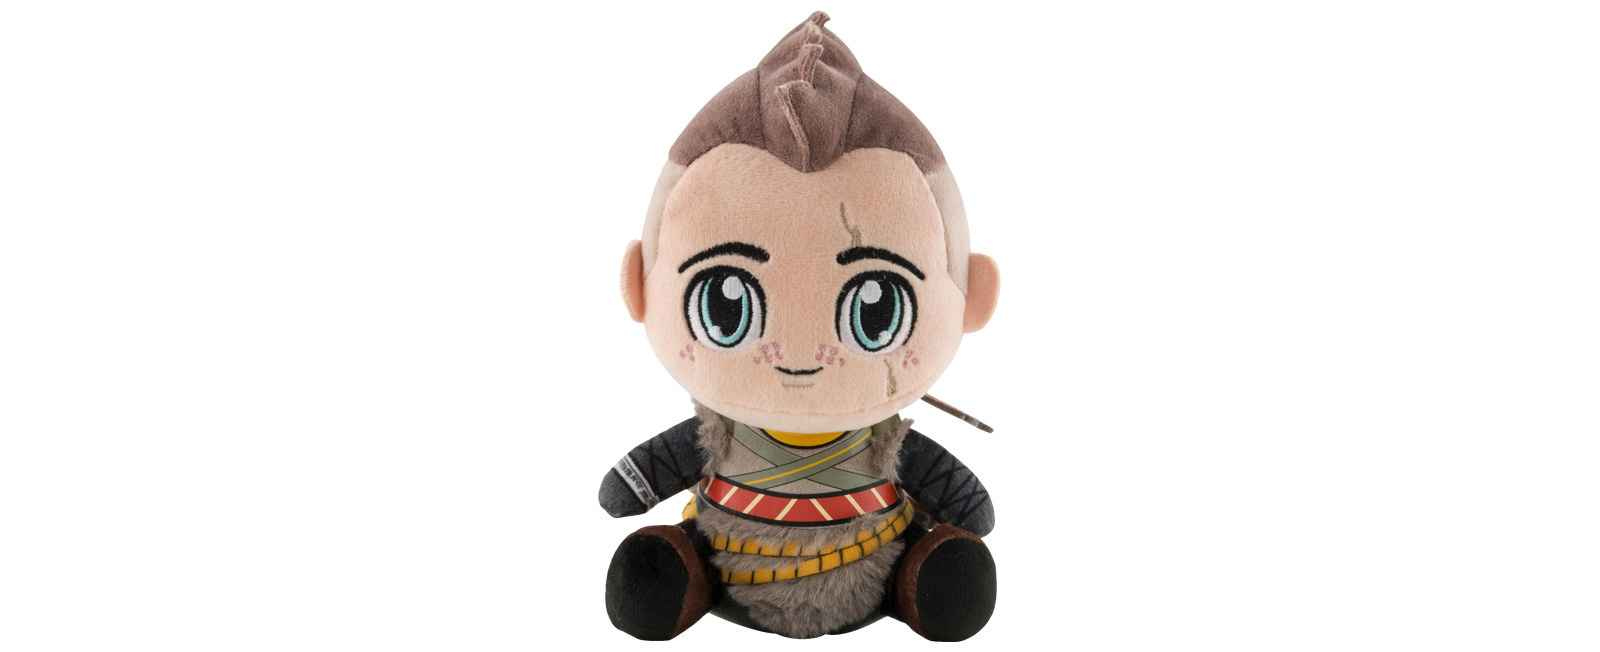 God of war plush toy